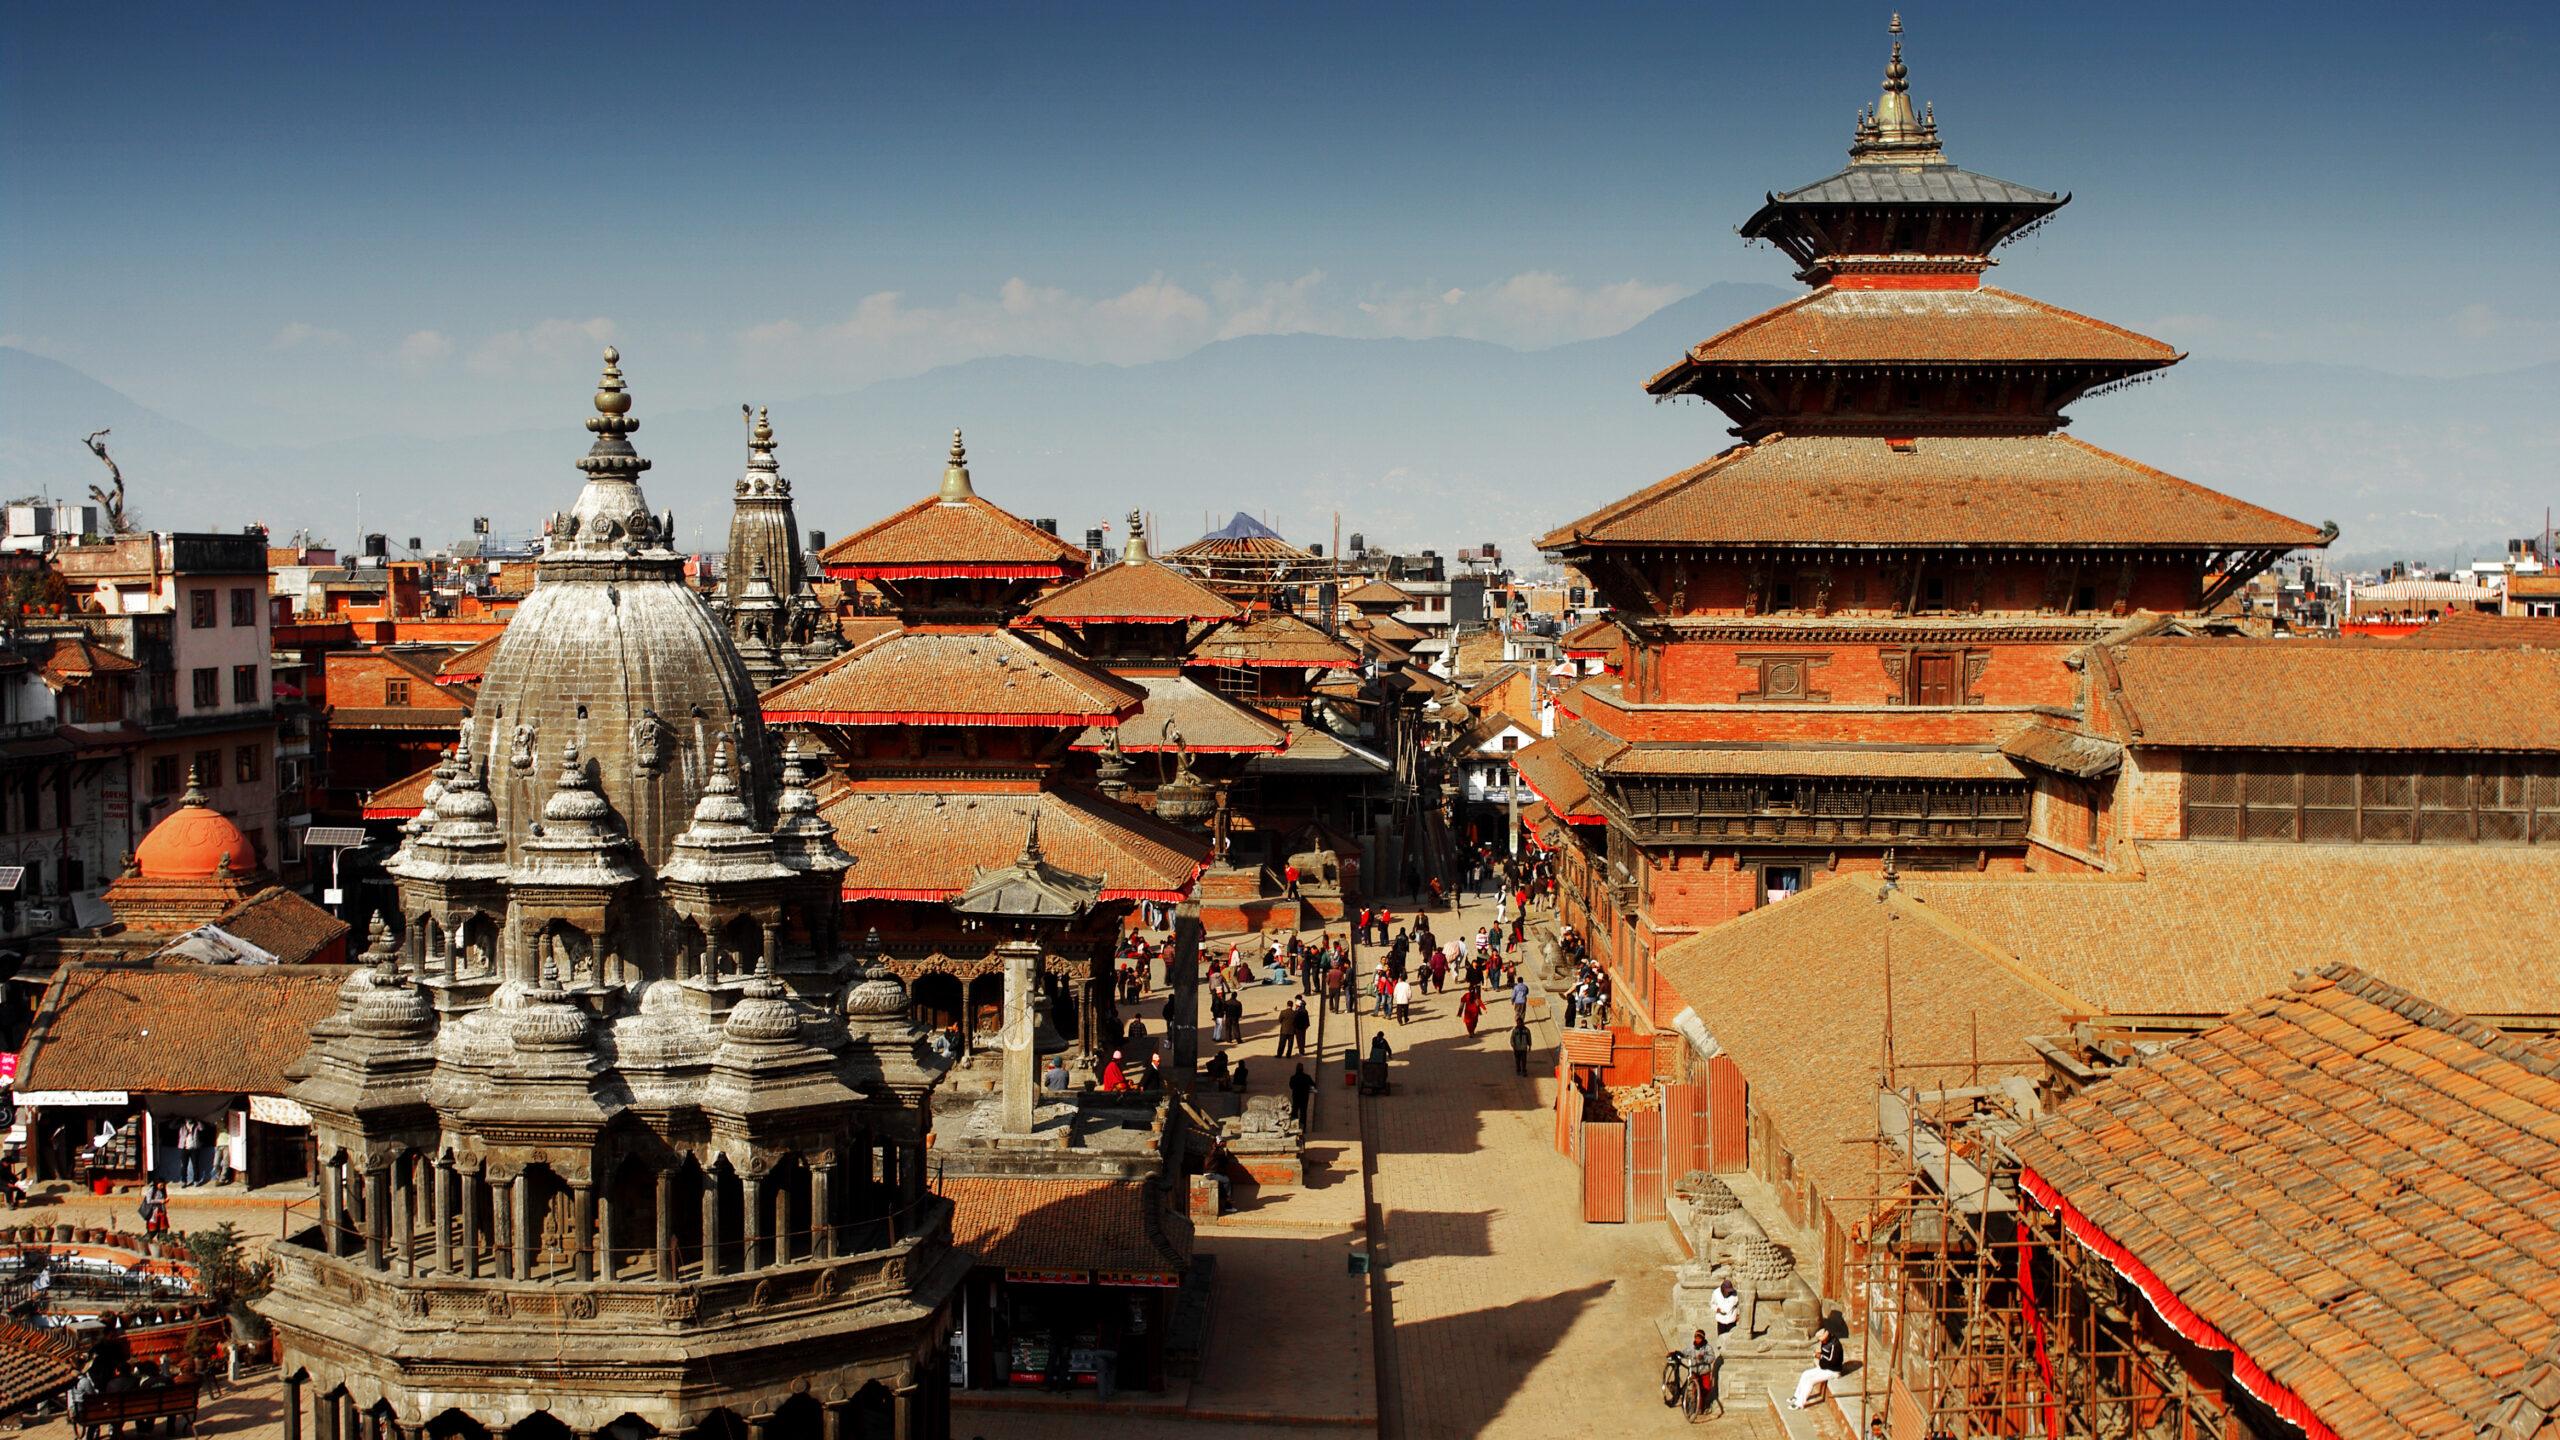 The Atlas Logistic Network is linking Kathmandu, Nepal to the world 1